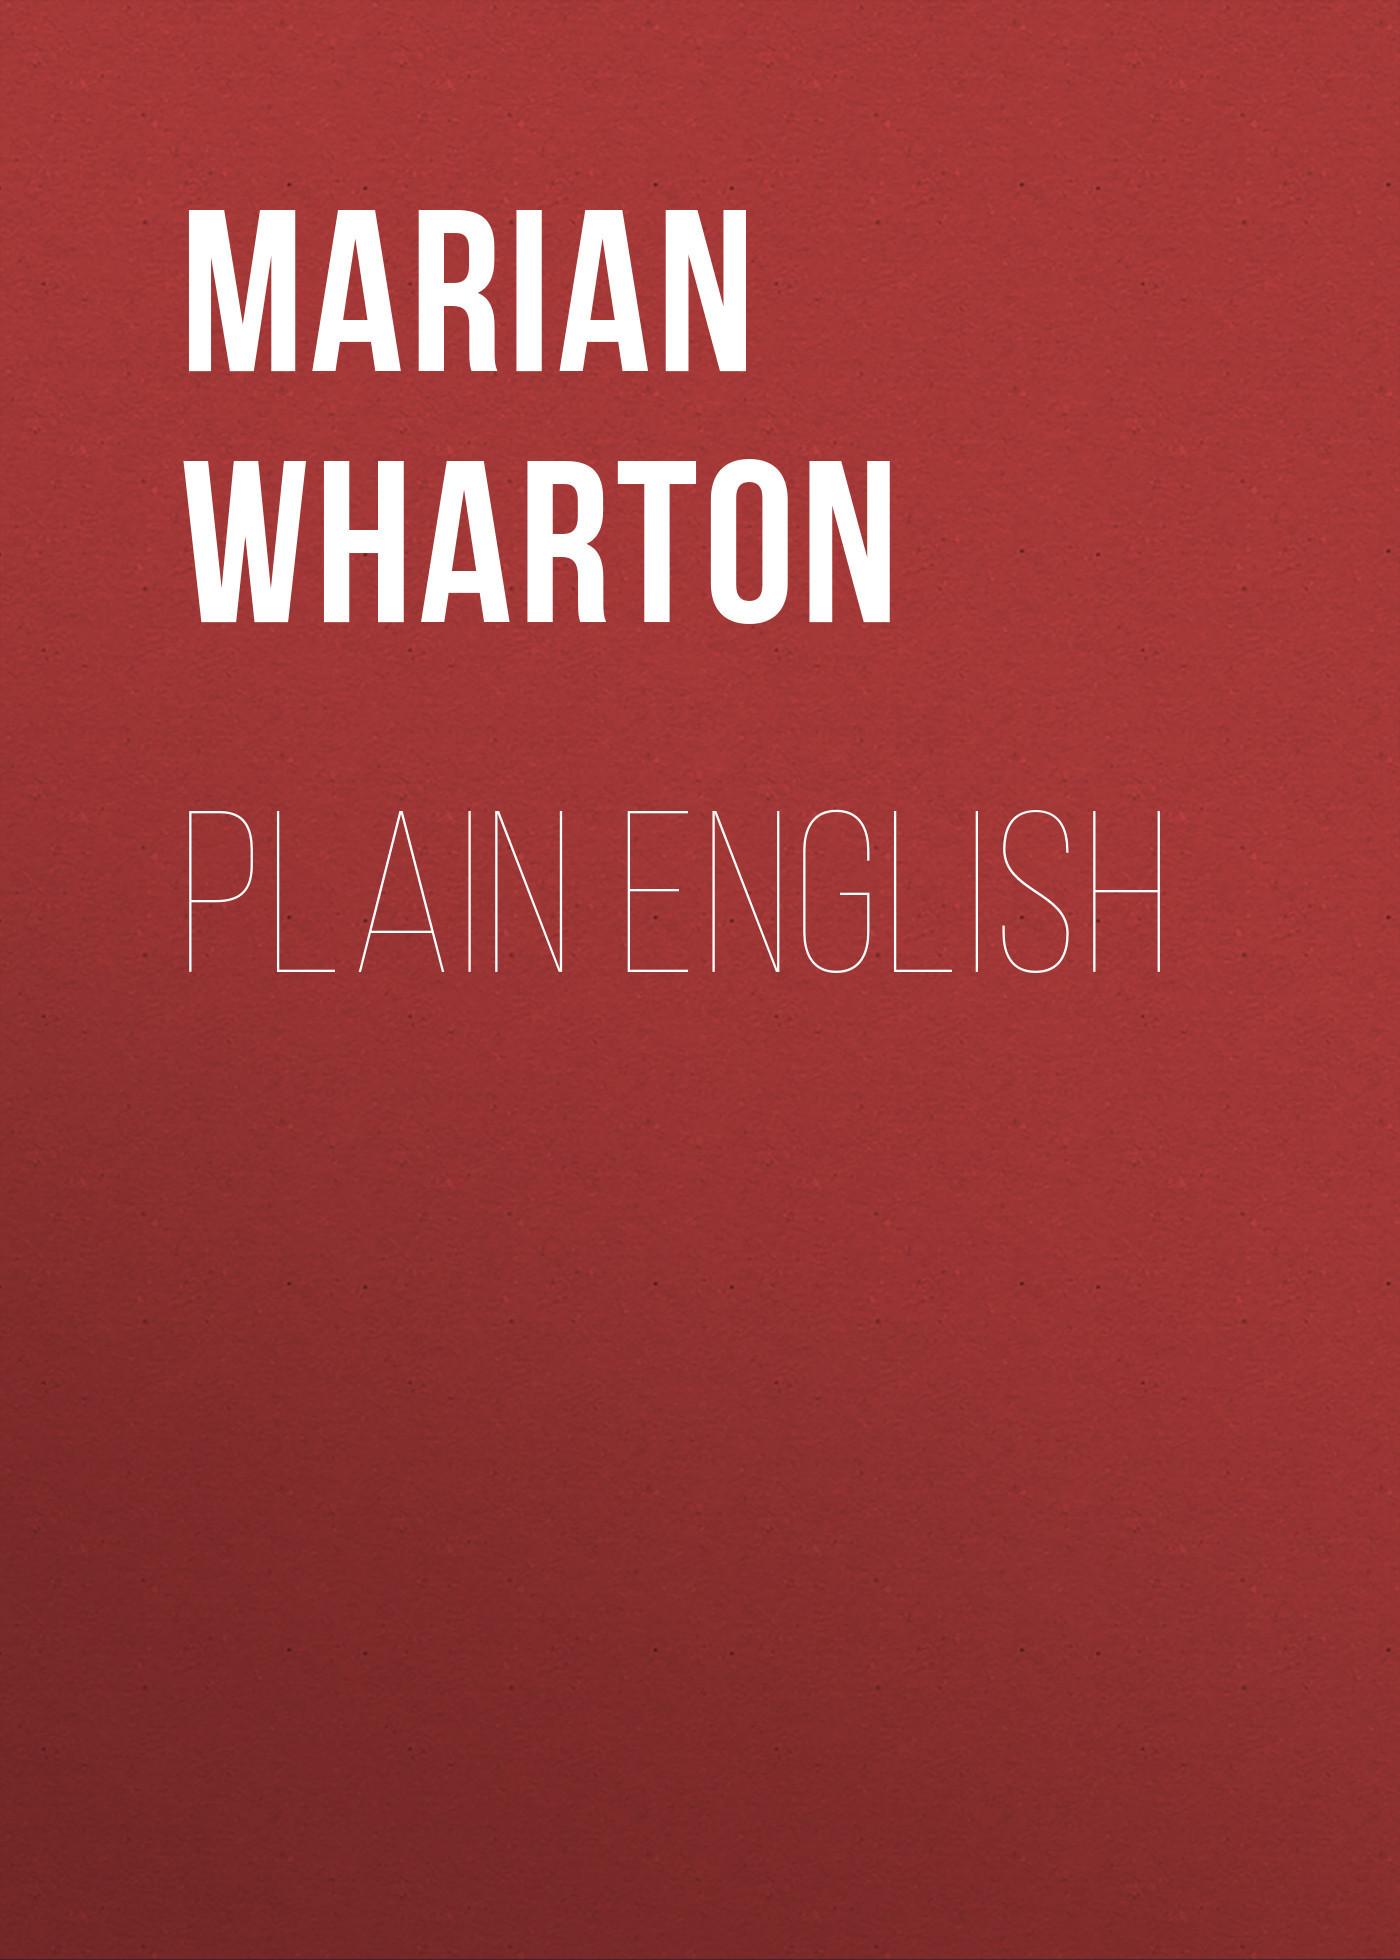 Marian Wharton Plain English xml in plain english